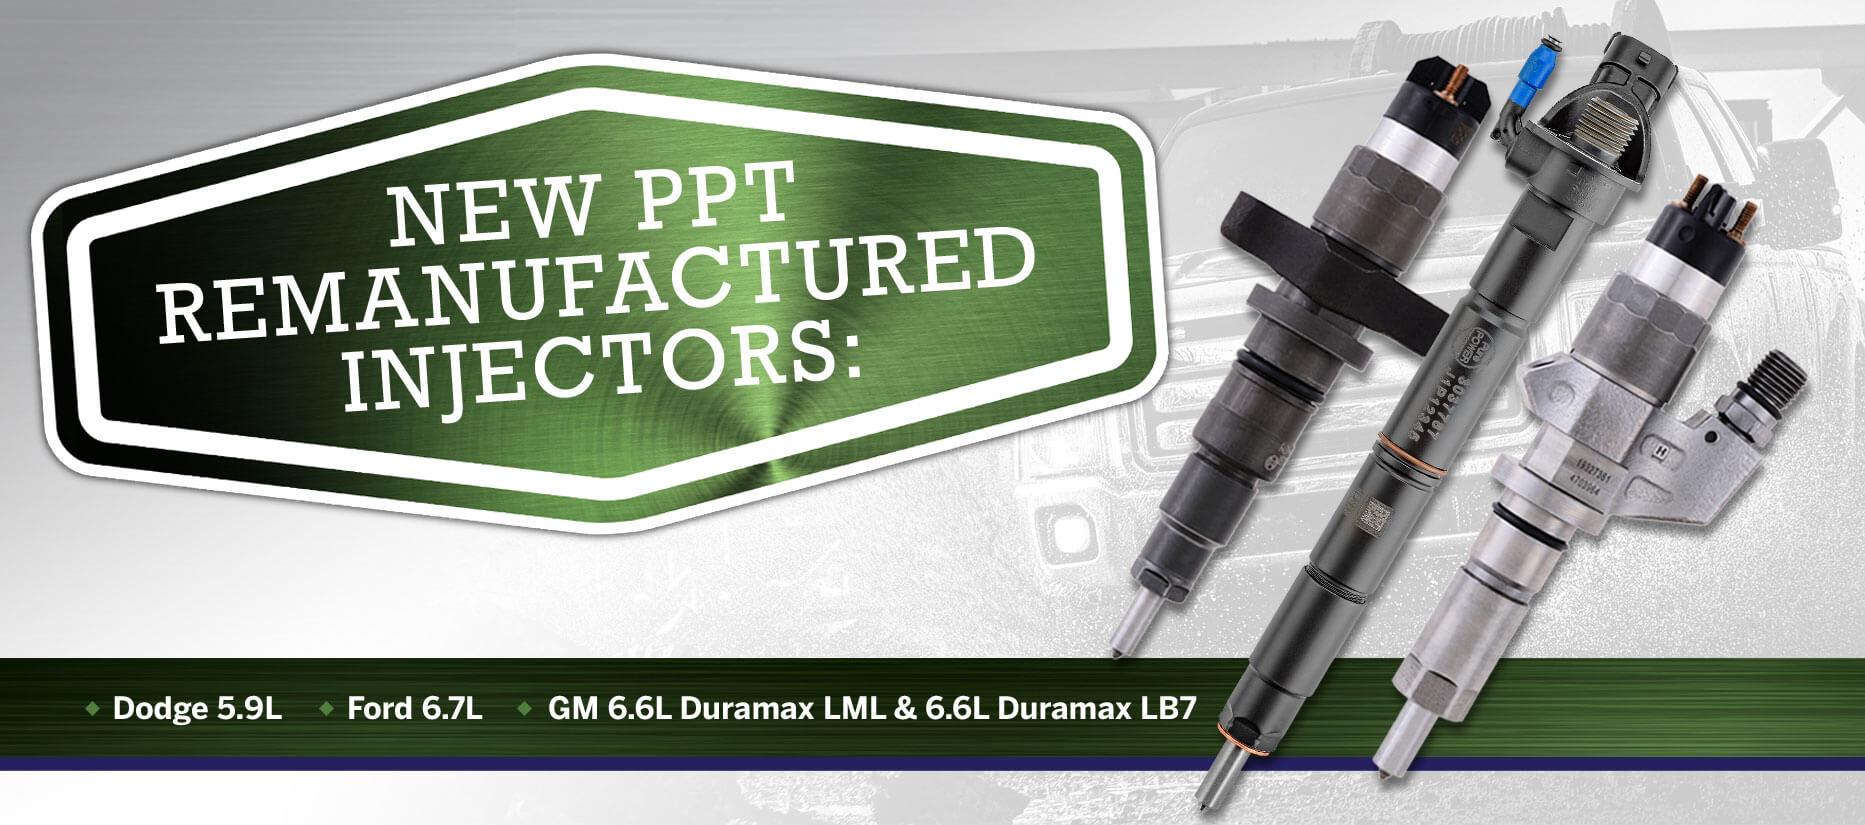 PurePOWER Technologies® Remanufactured Injectors